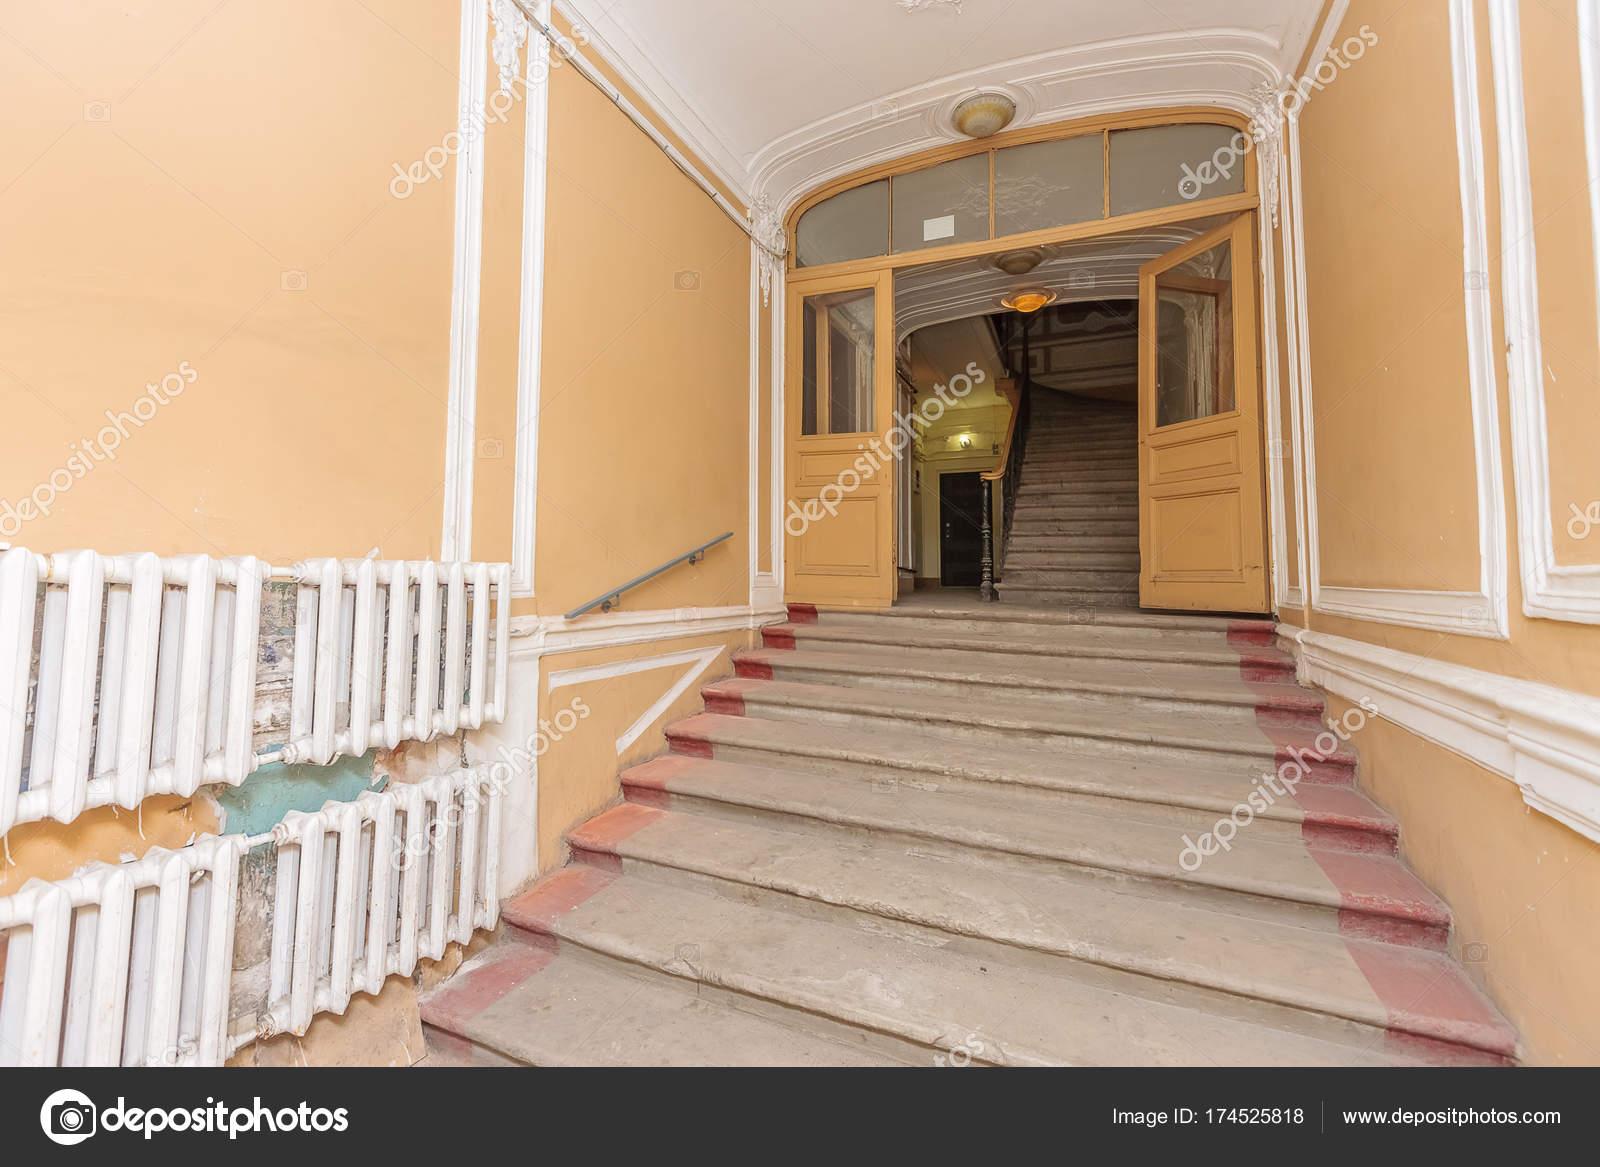 Treppenhaus mehrfamilienhaus  Mehrfamilienhaus Treppenhaus — Stockfoto © olgasweet #174525818